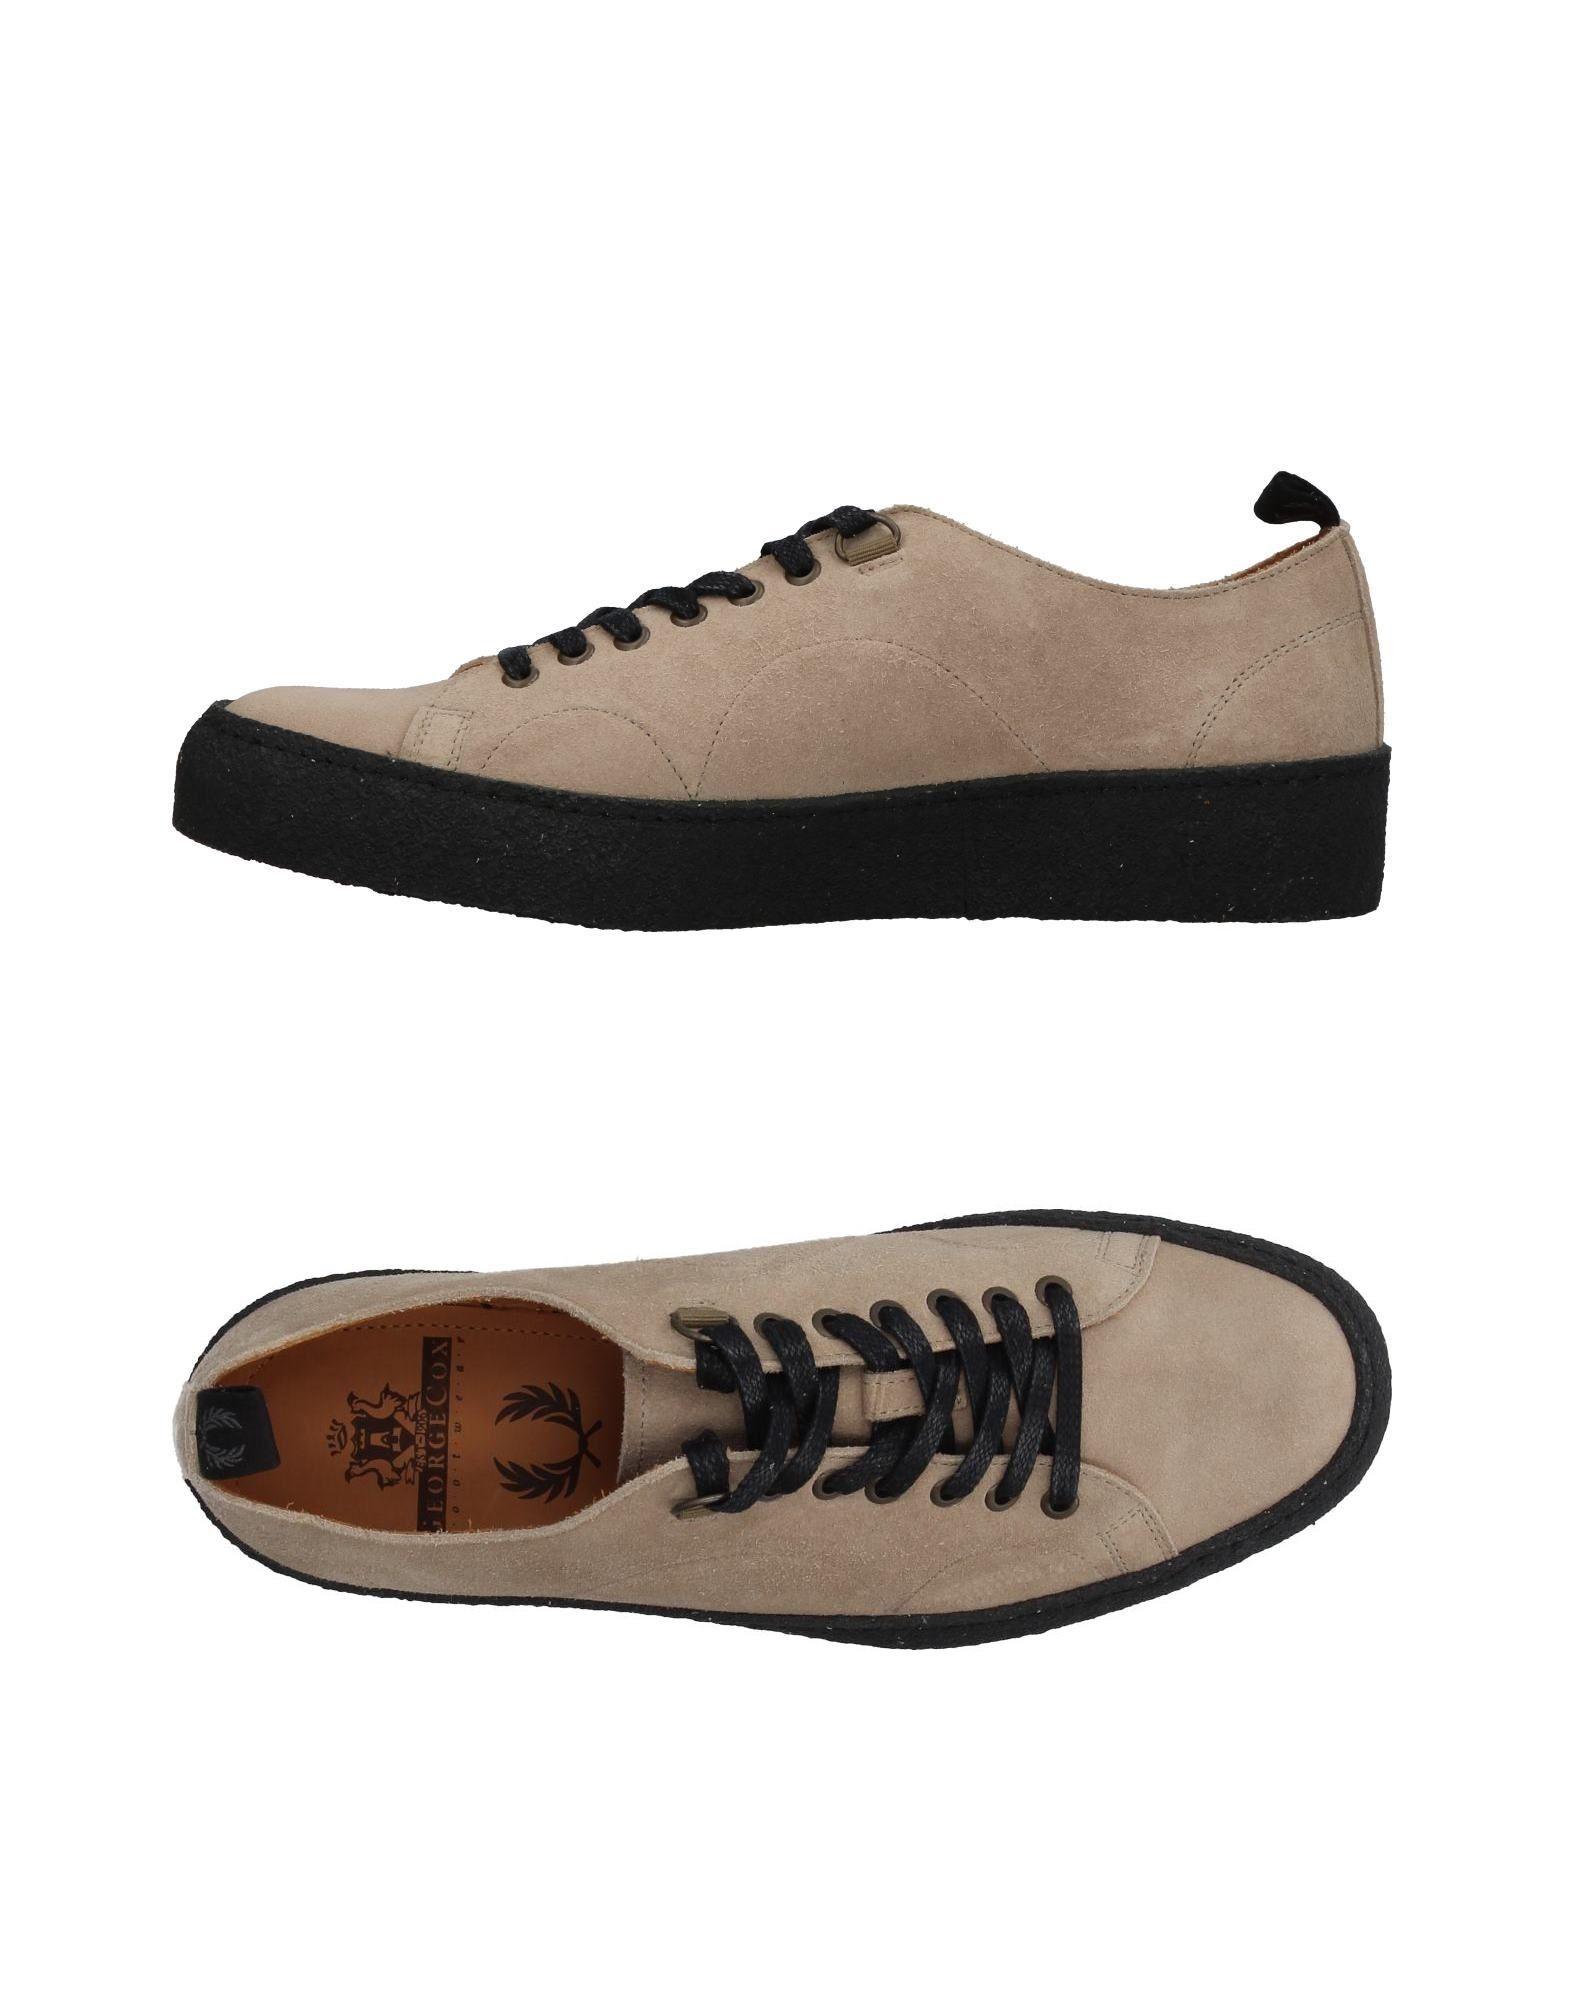 Sneakers Fred Perry Homme - Sneakers Fred Perry  Bleu foncé Dernières chaussures discount pour hommes et femmes